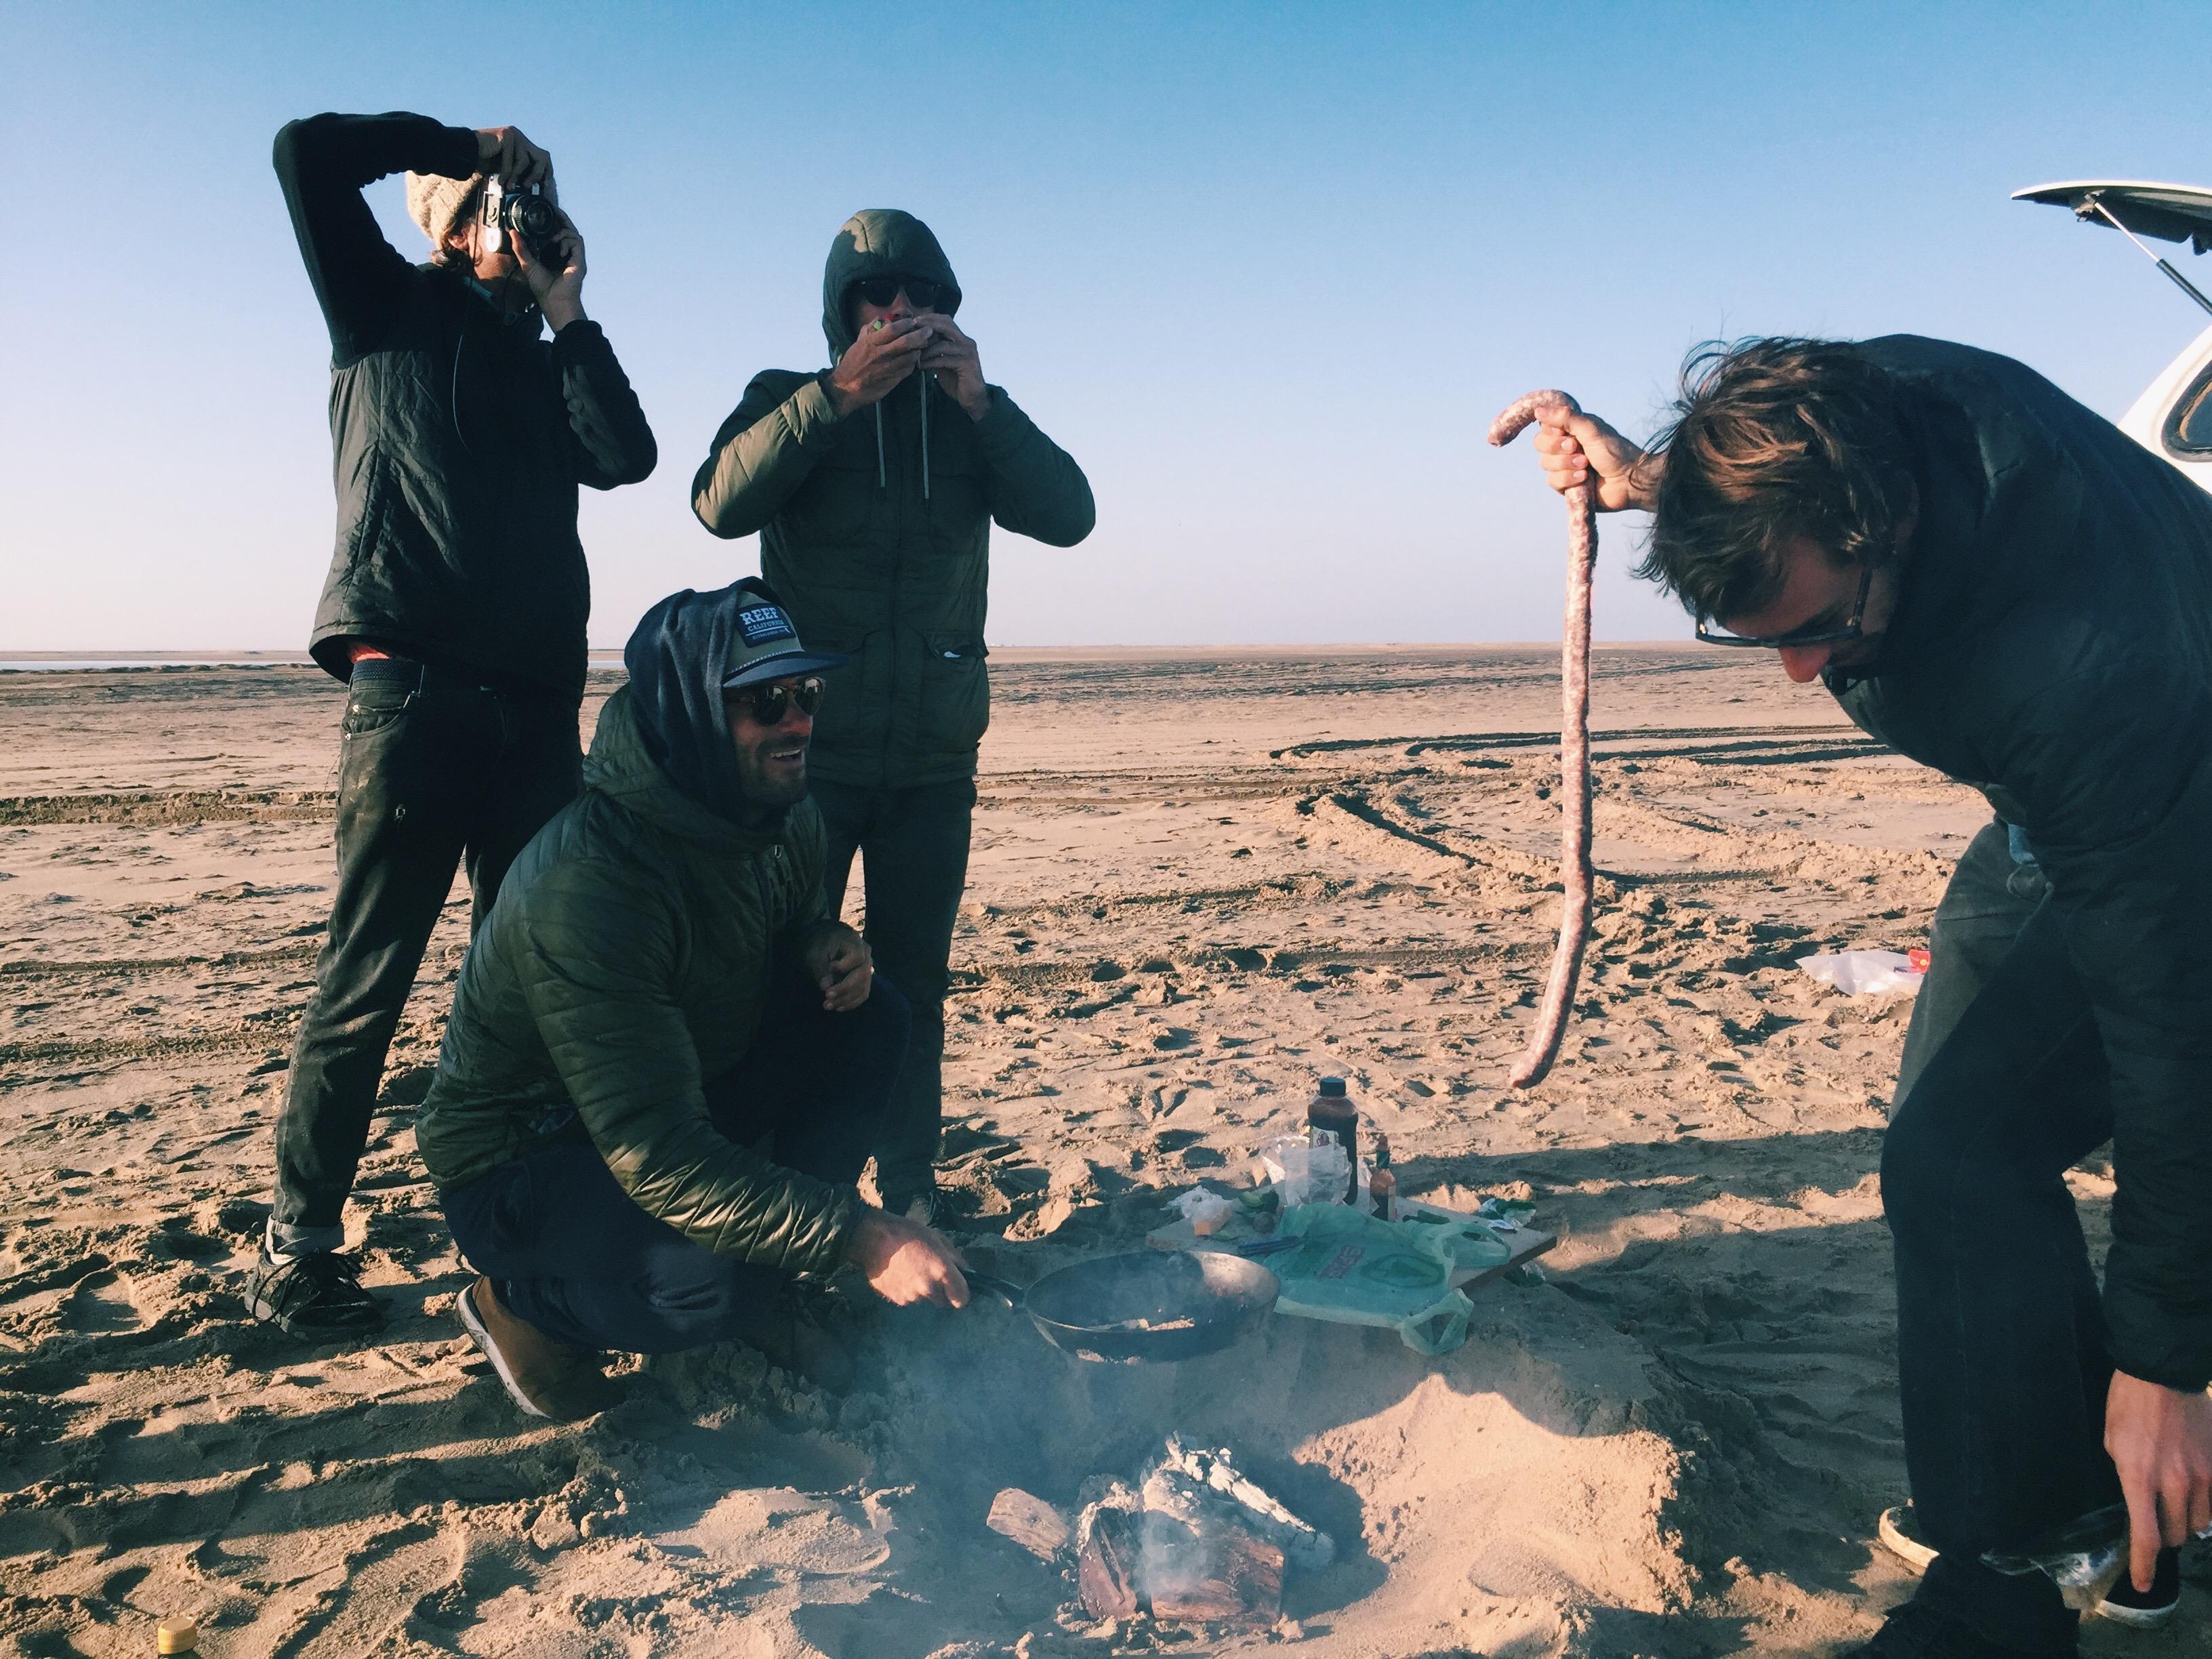 Roberto D'Amico Eugenio Barcelloni Namibia Skeleton Bay intervista